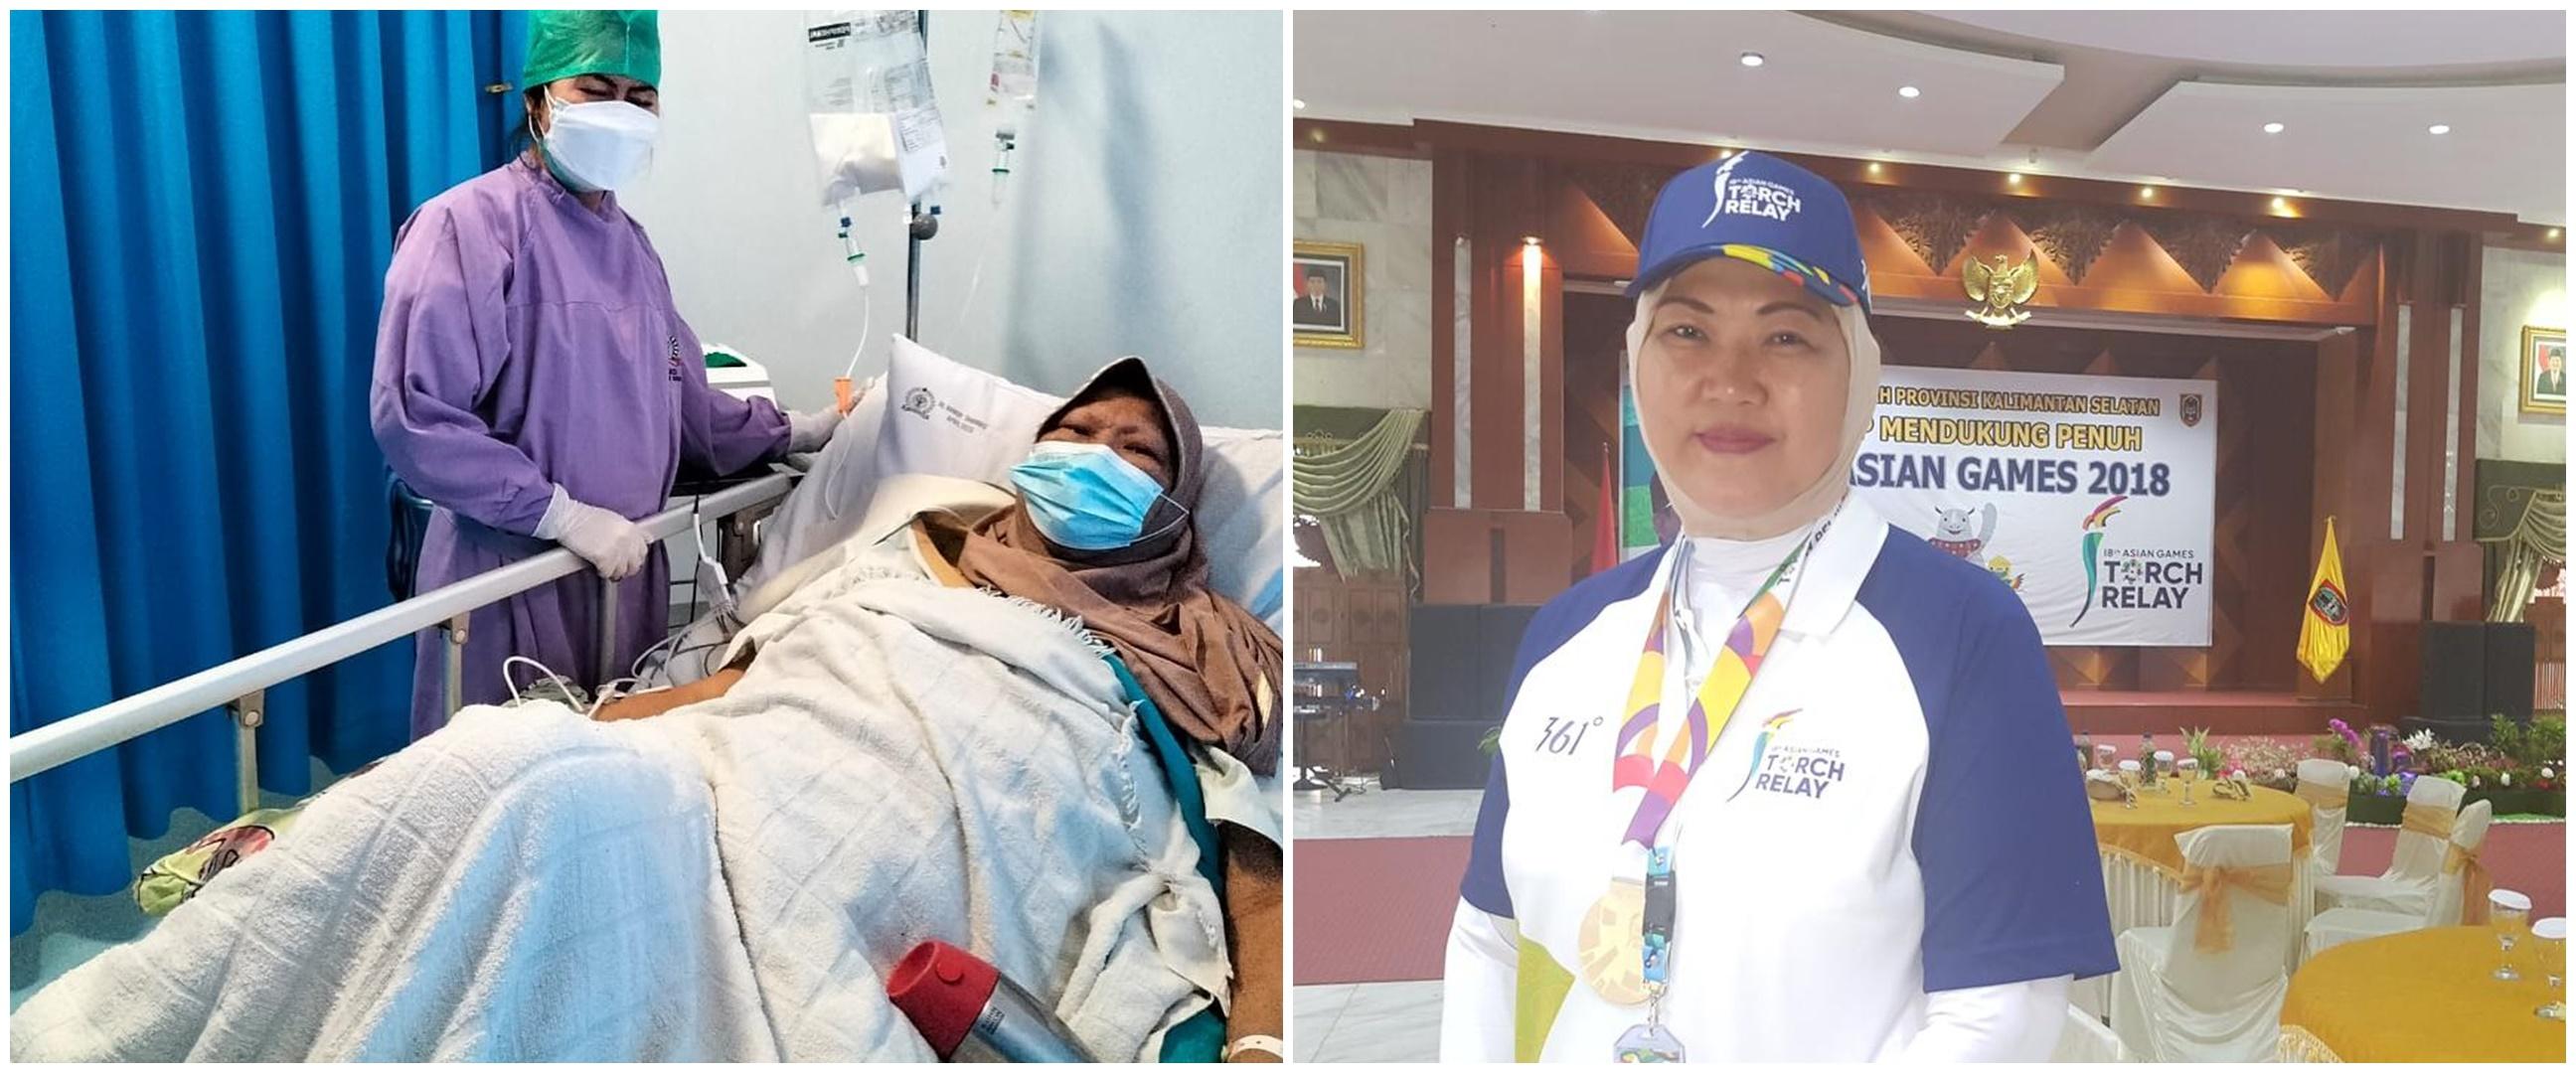 Legenda bulu tangkis Verawaty Fajrin idap kanker, begini kabar terbaru